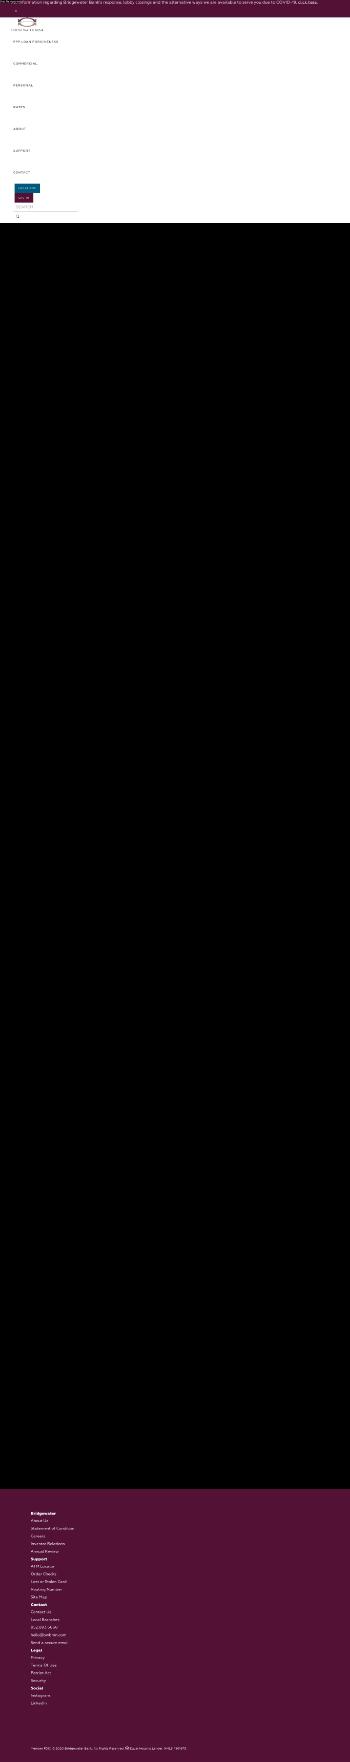 Bridgewater Bancshares, Inc. Website Screenshot